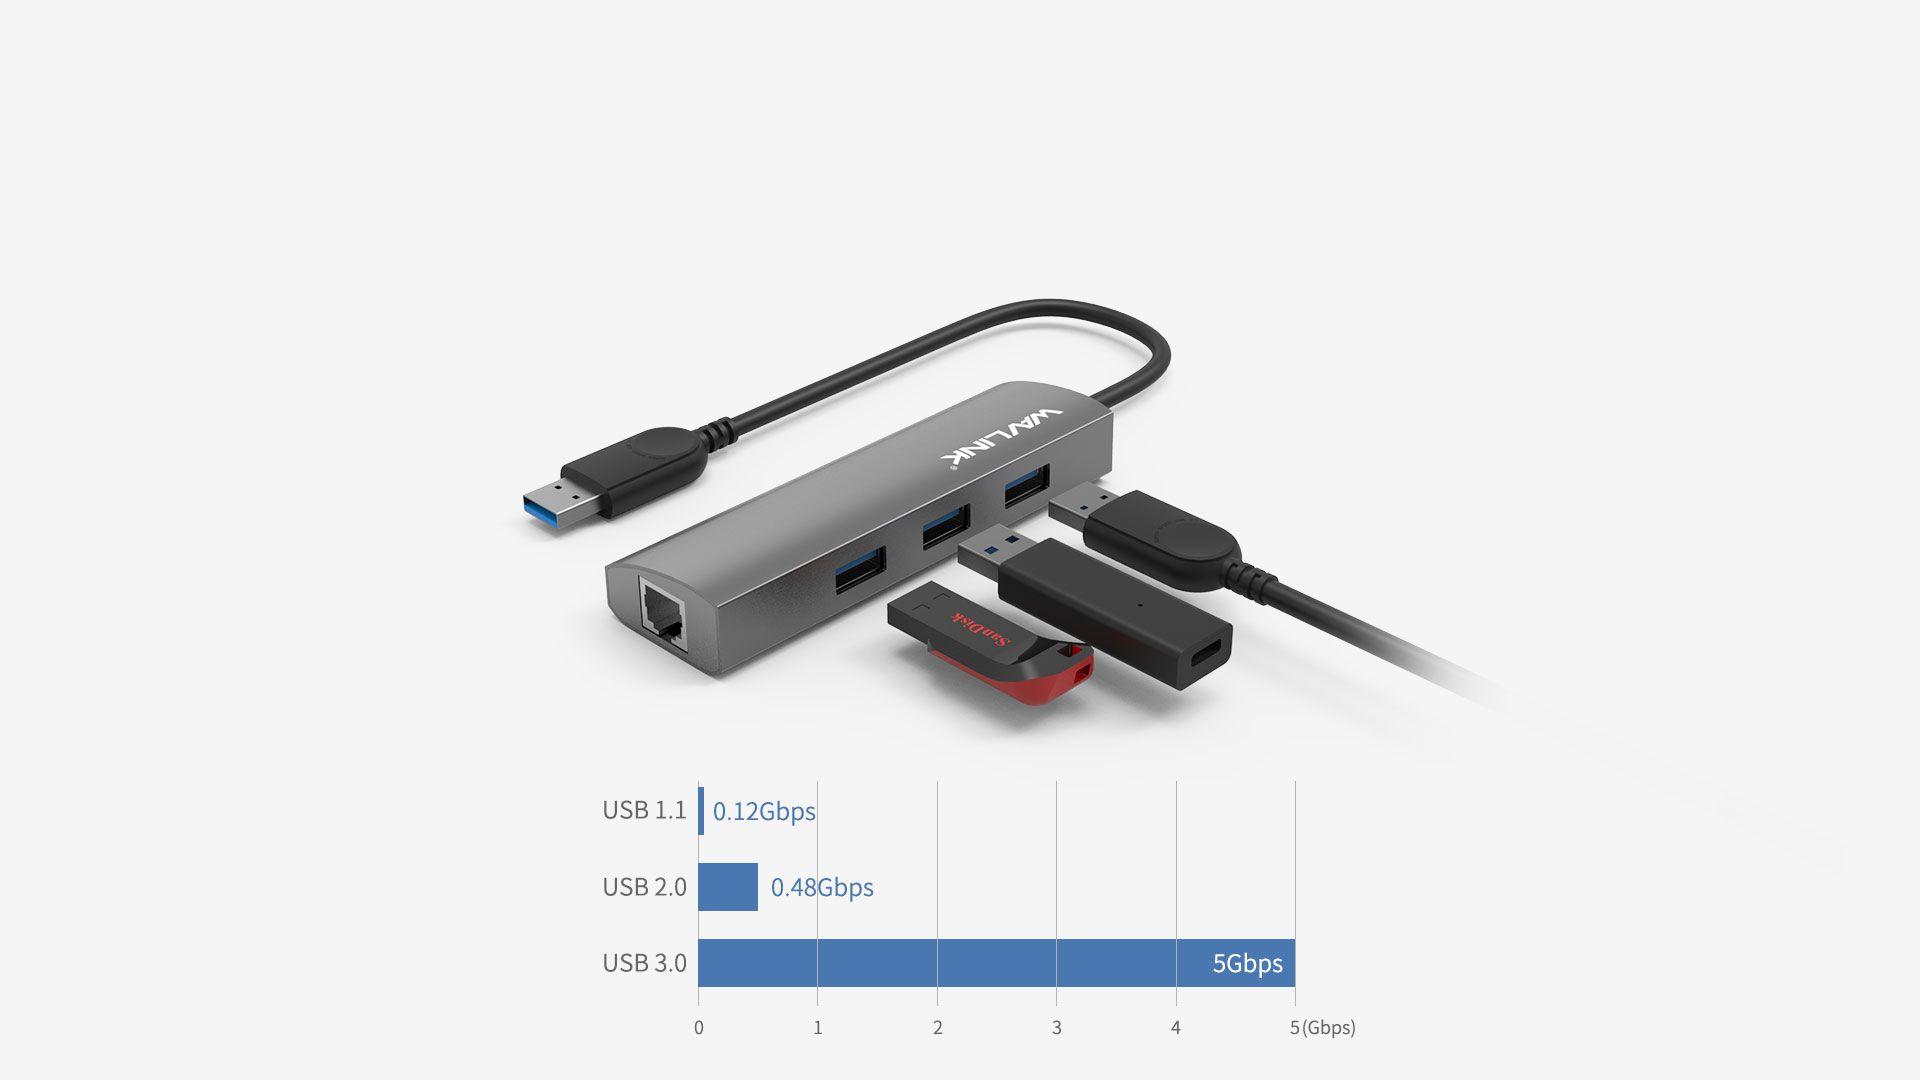 WAVLINK USB 3.0 4-PORT HUB WITH GIGABIT ETHERNET 4 7